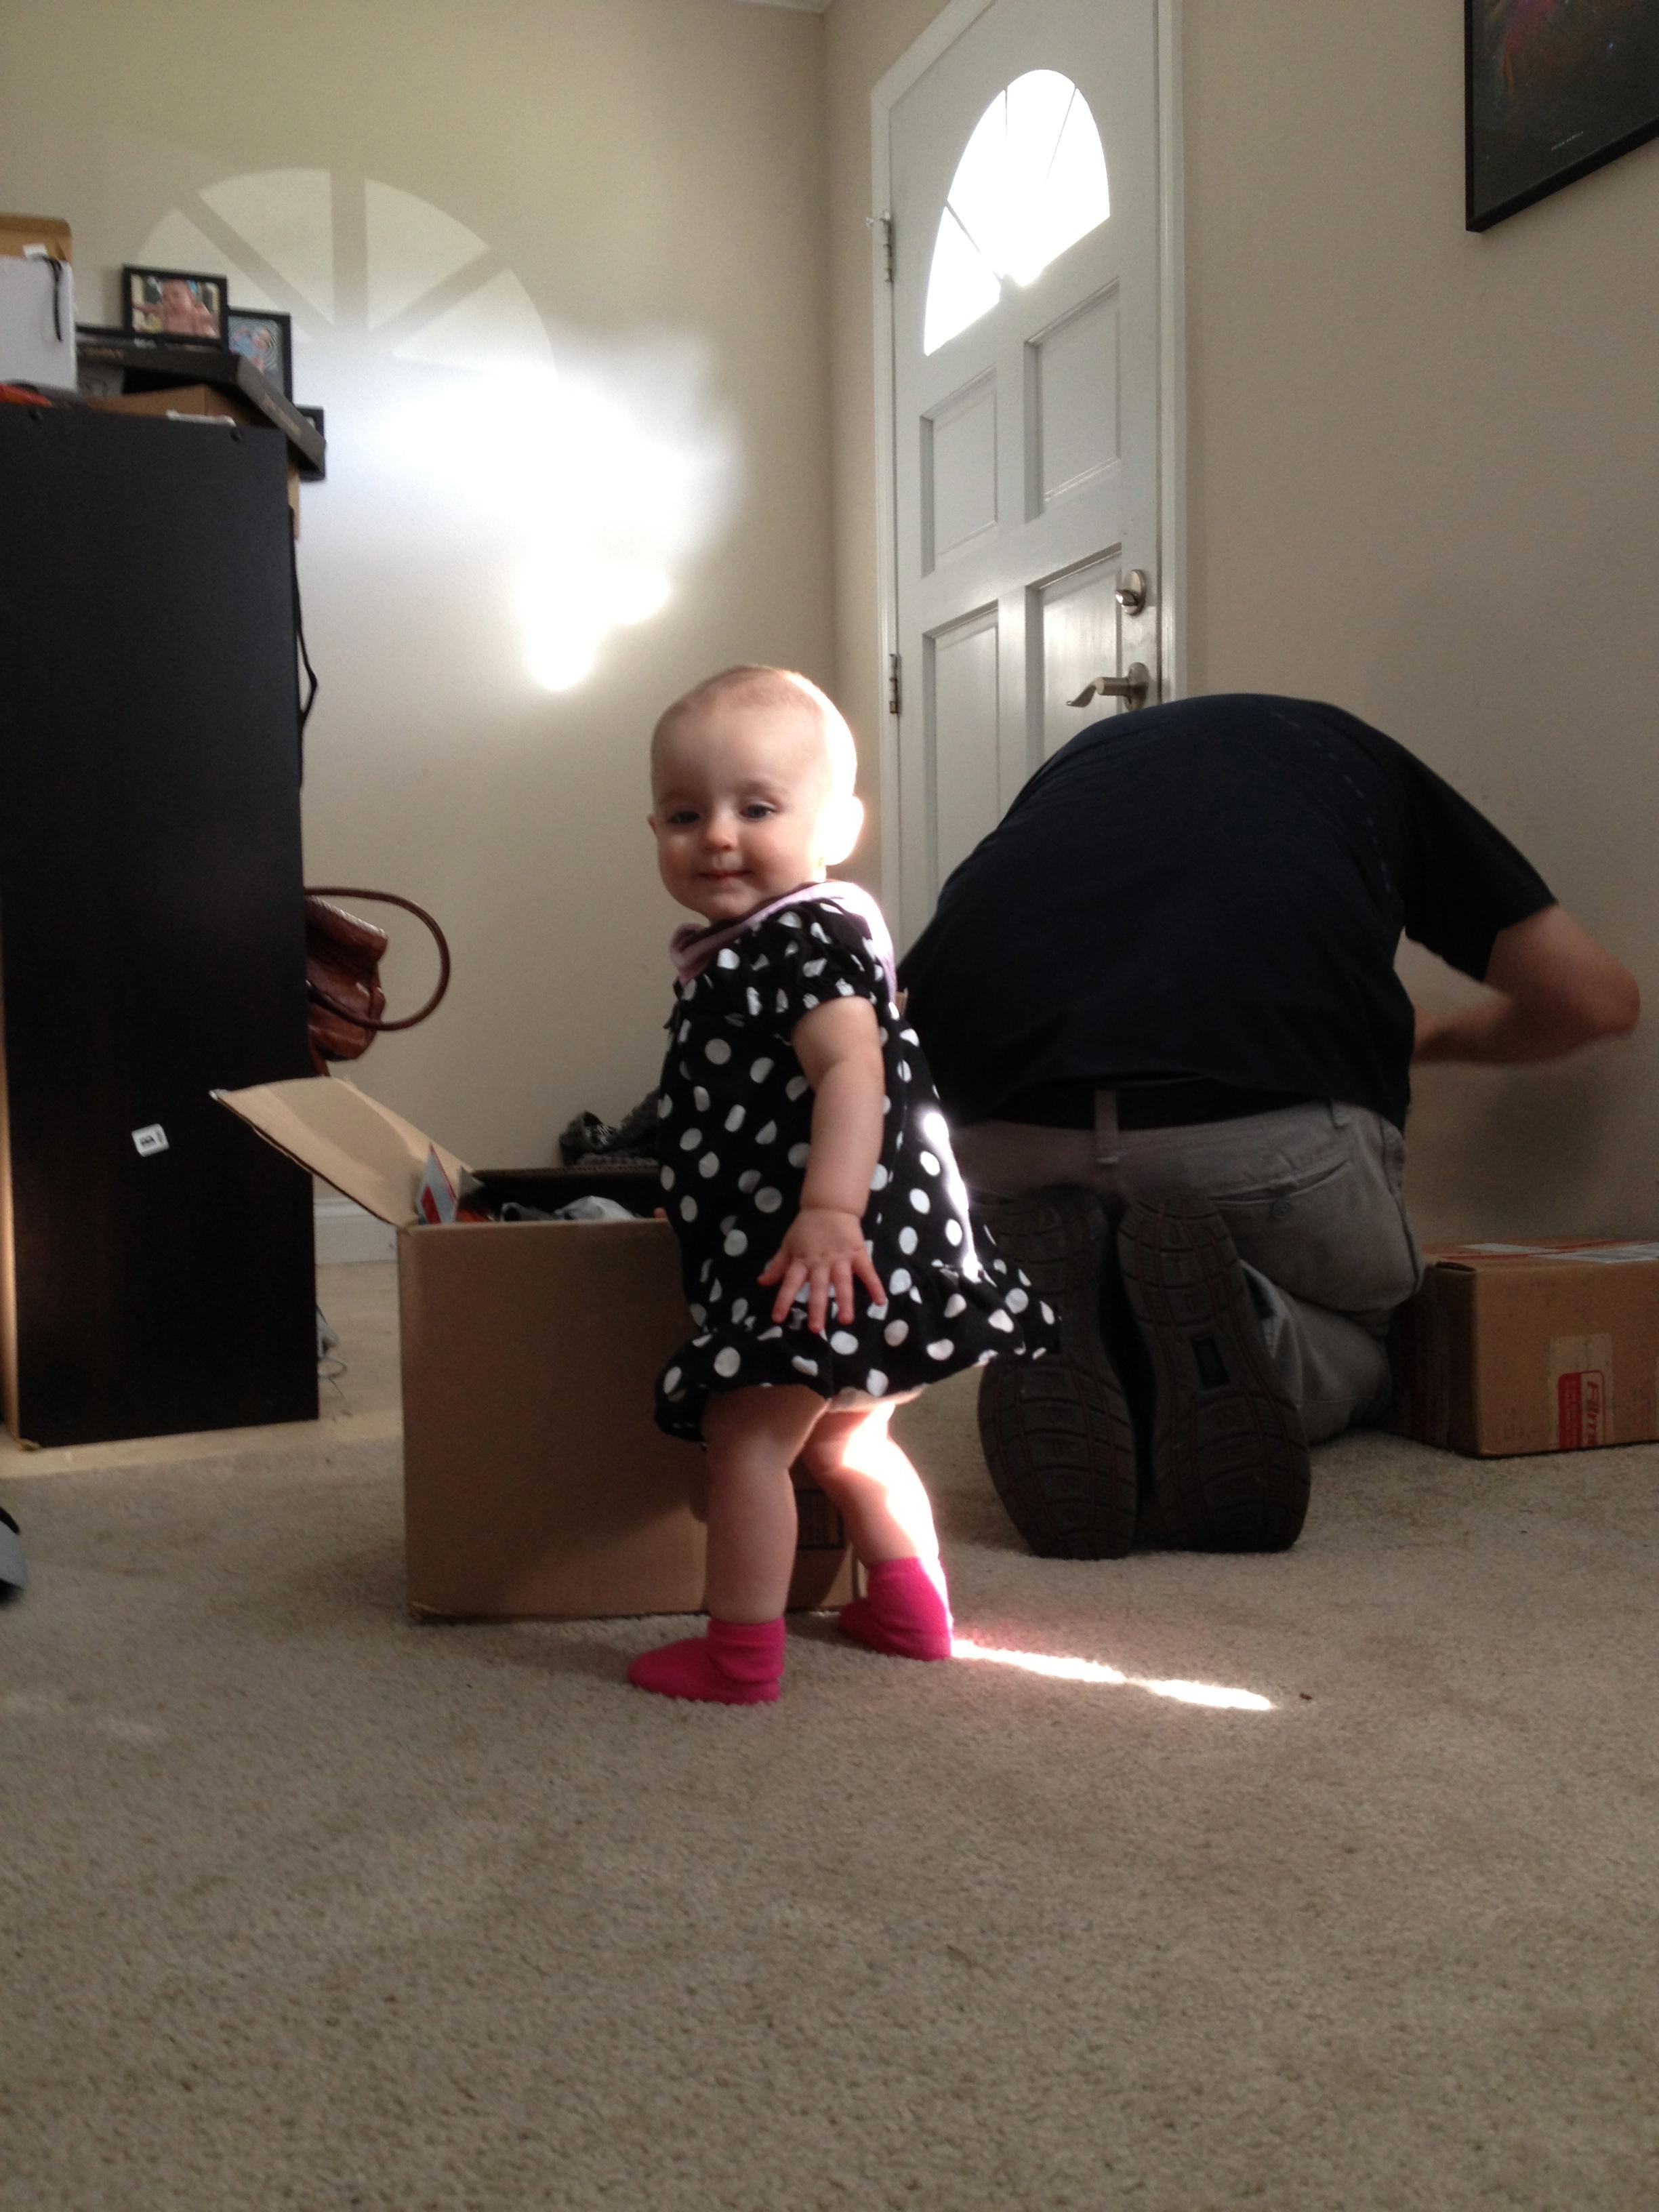 helping us unpack